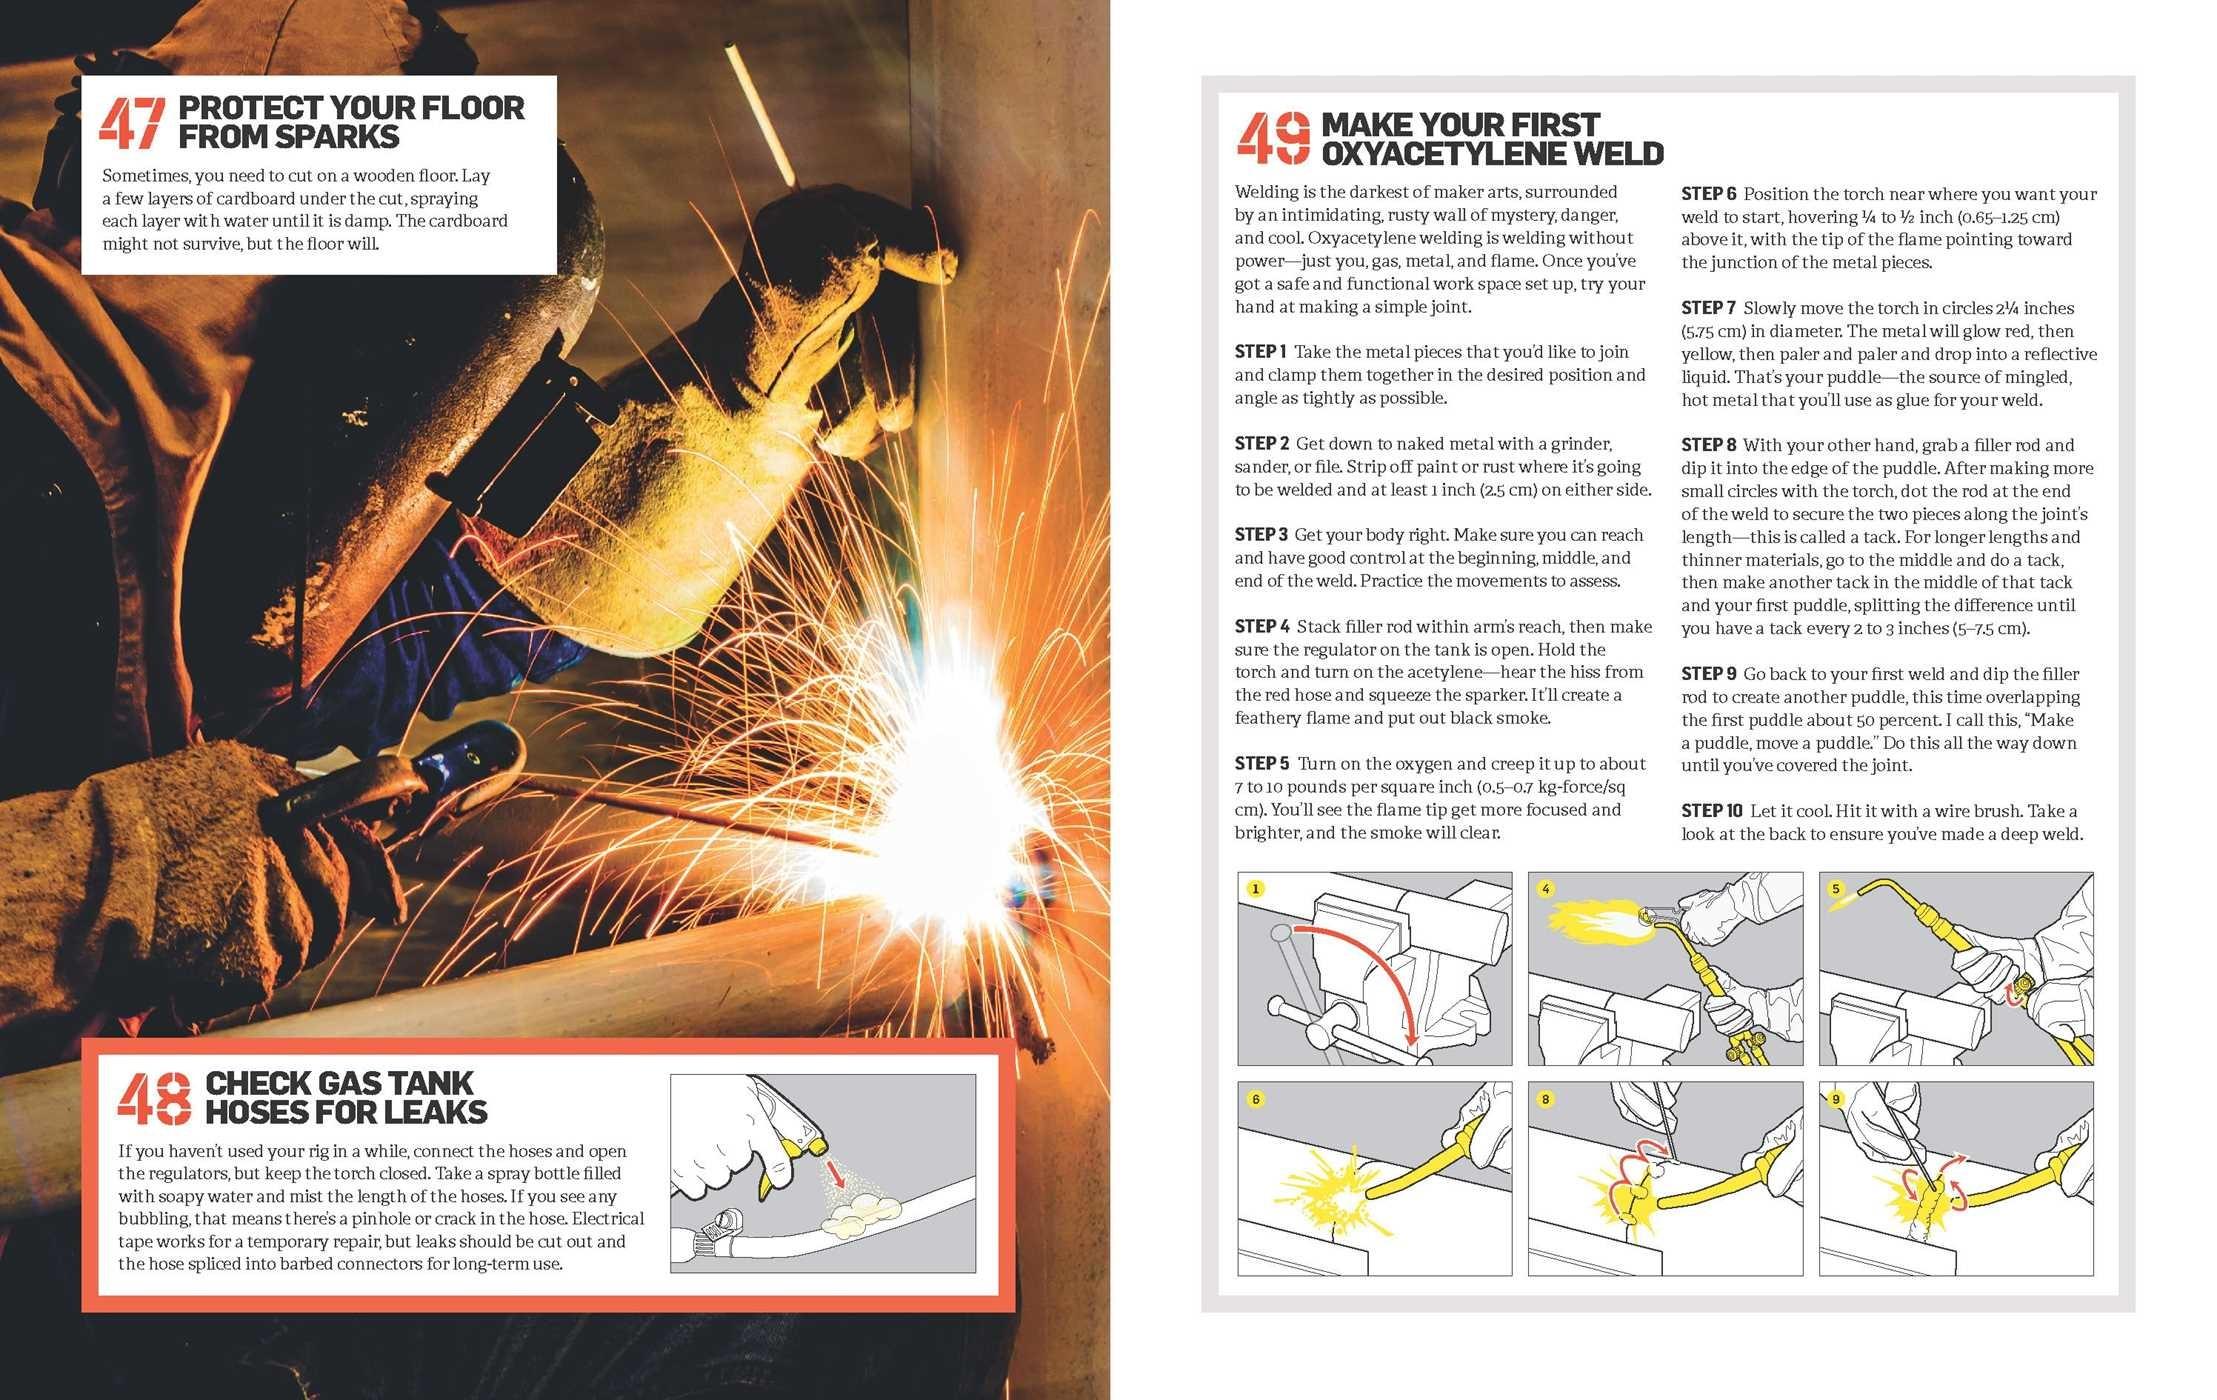 The big book of maker skills (popular science) 9781616287269.in01